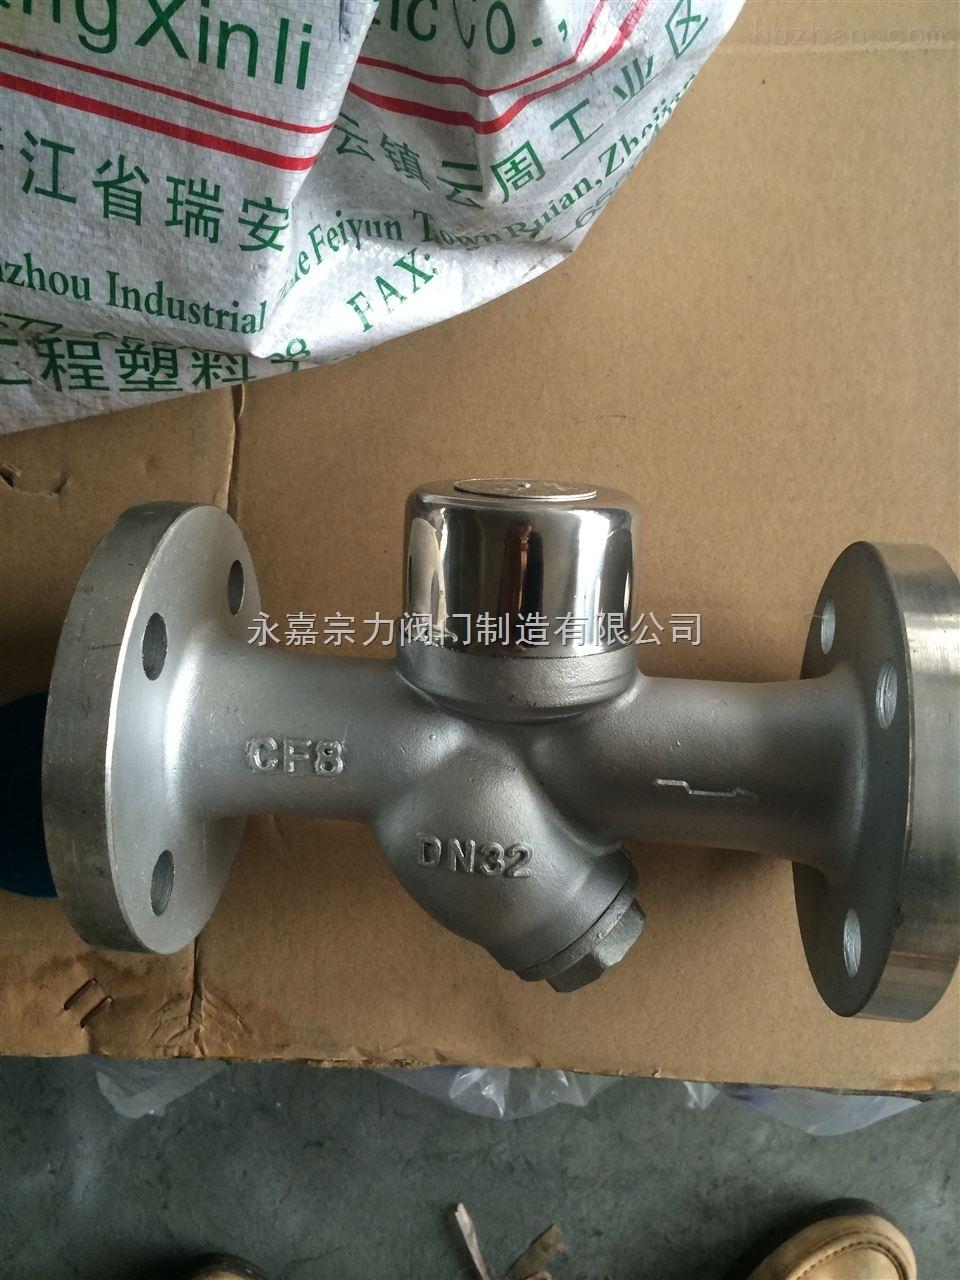 td42 热动力圆盘式蒸汽疏水阀图片